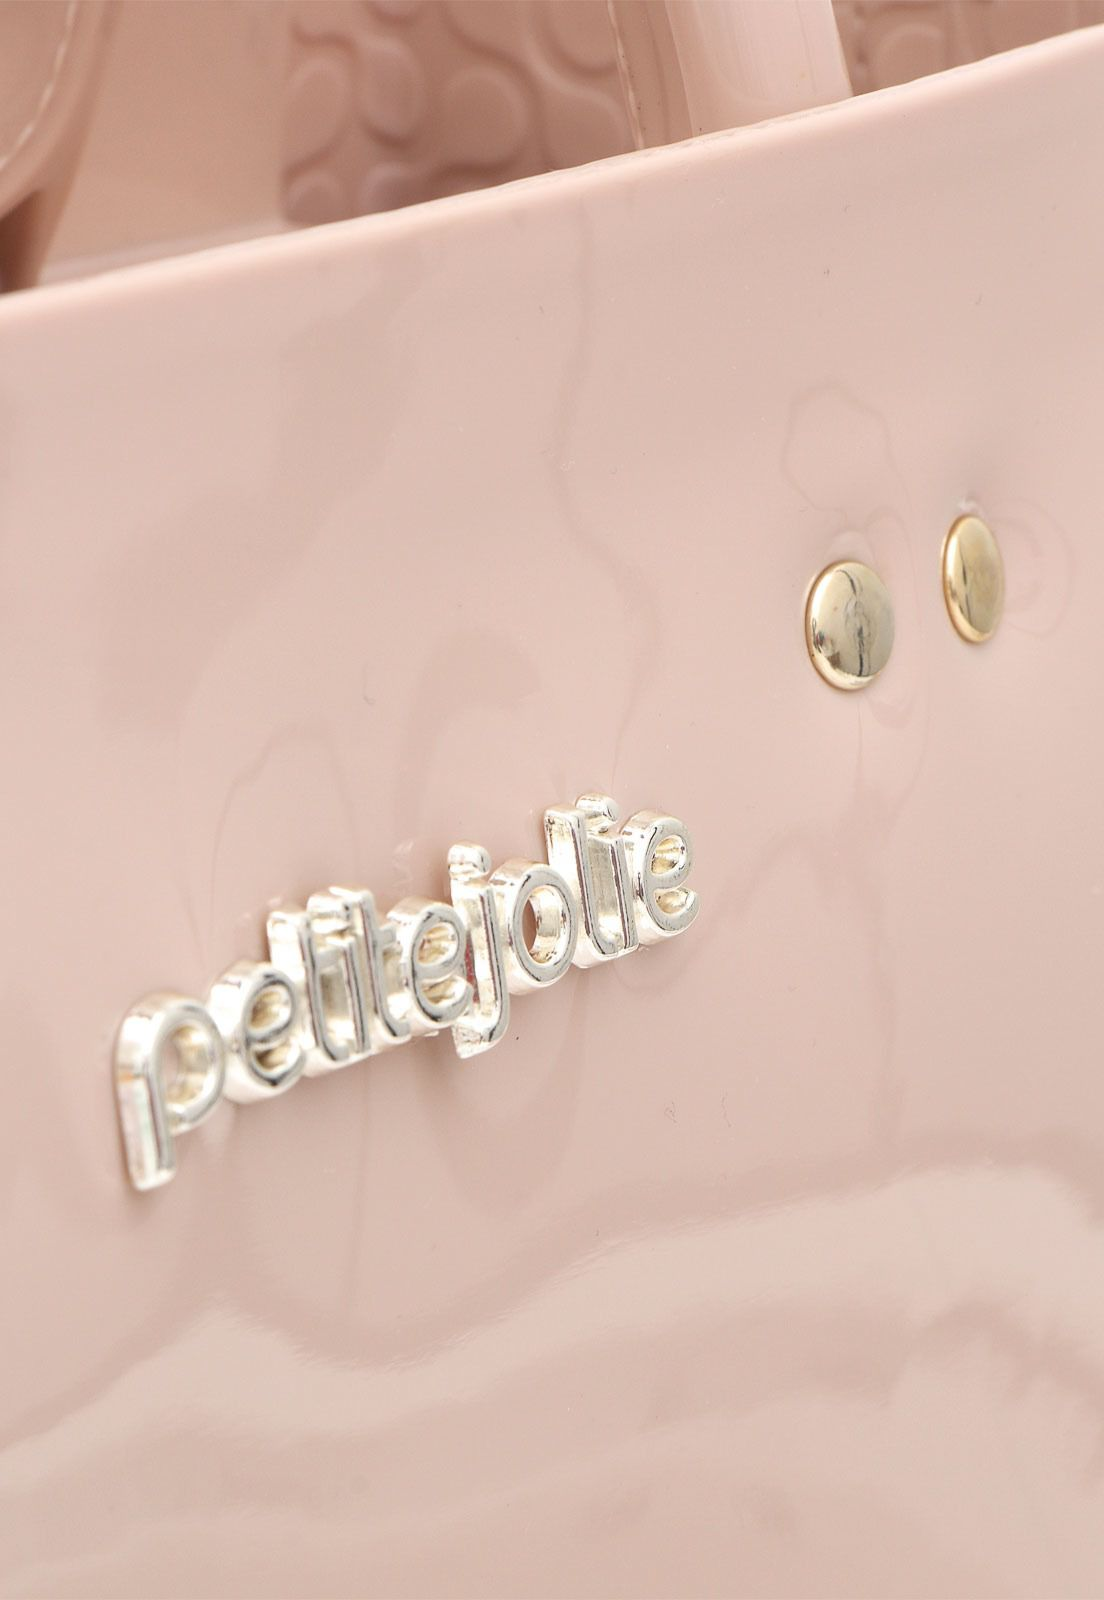 Bolsa Petite Jolie Stella - Pj4155